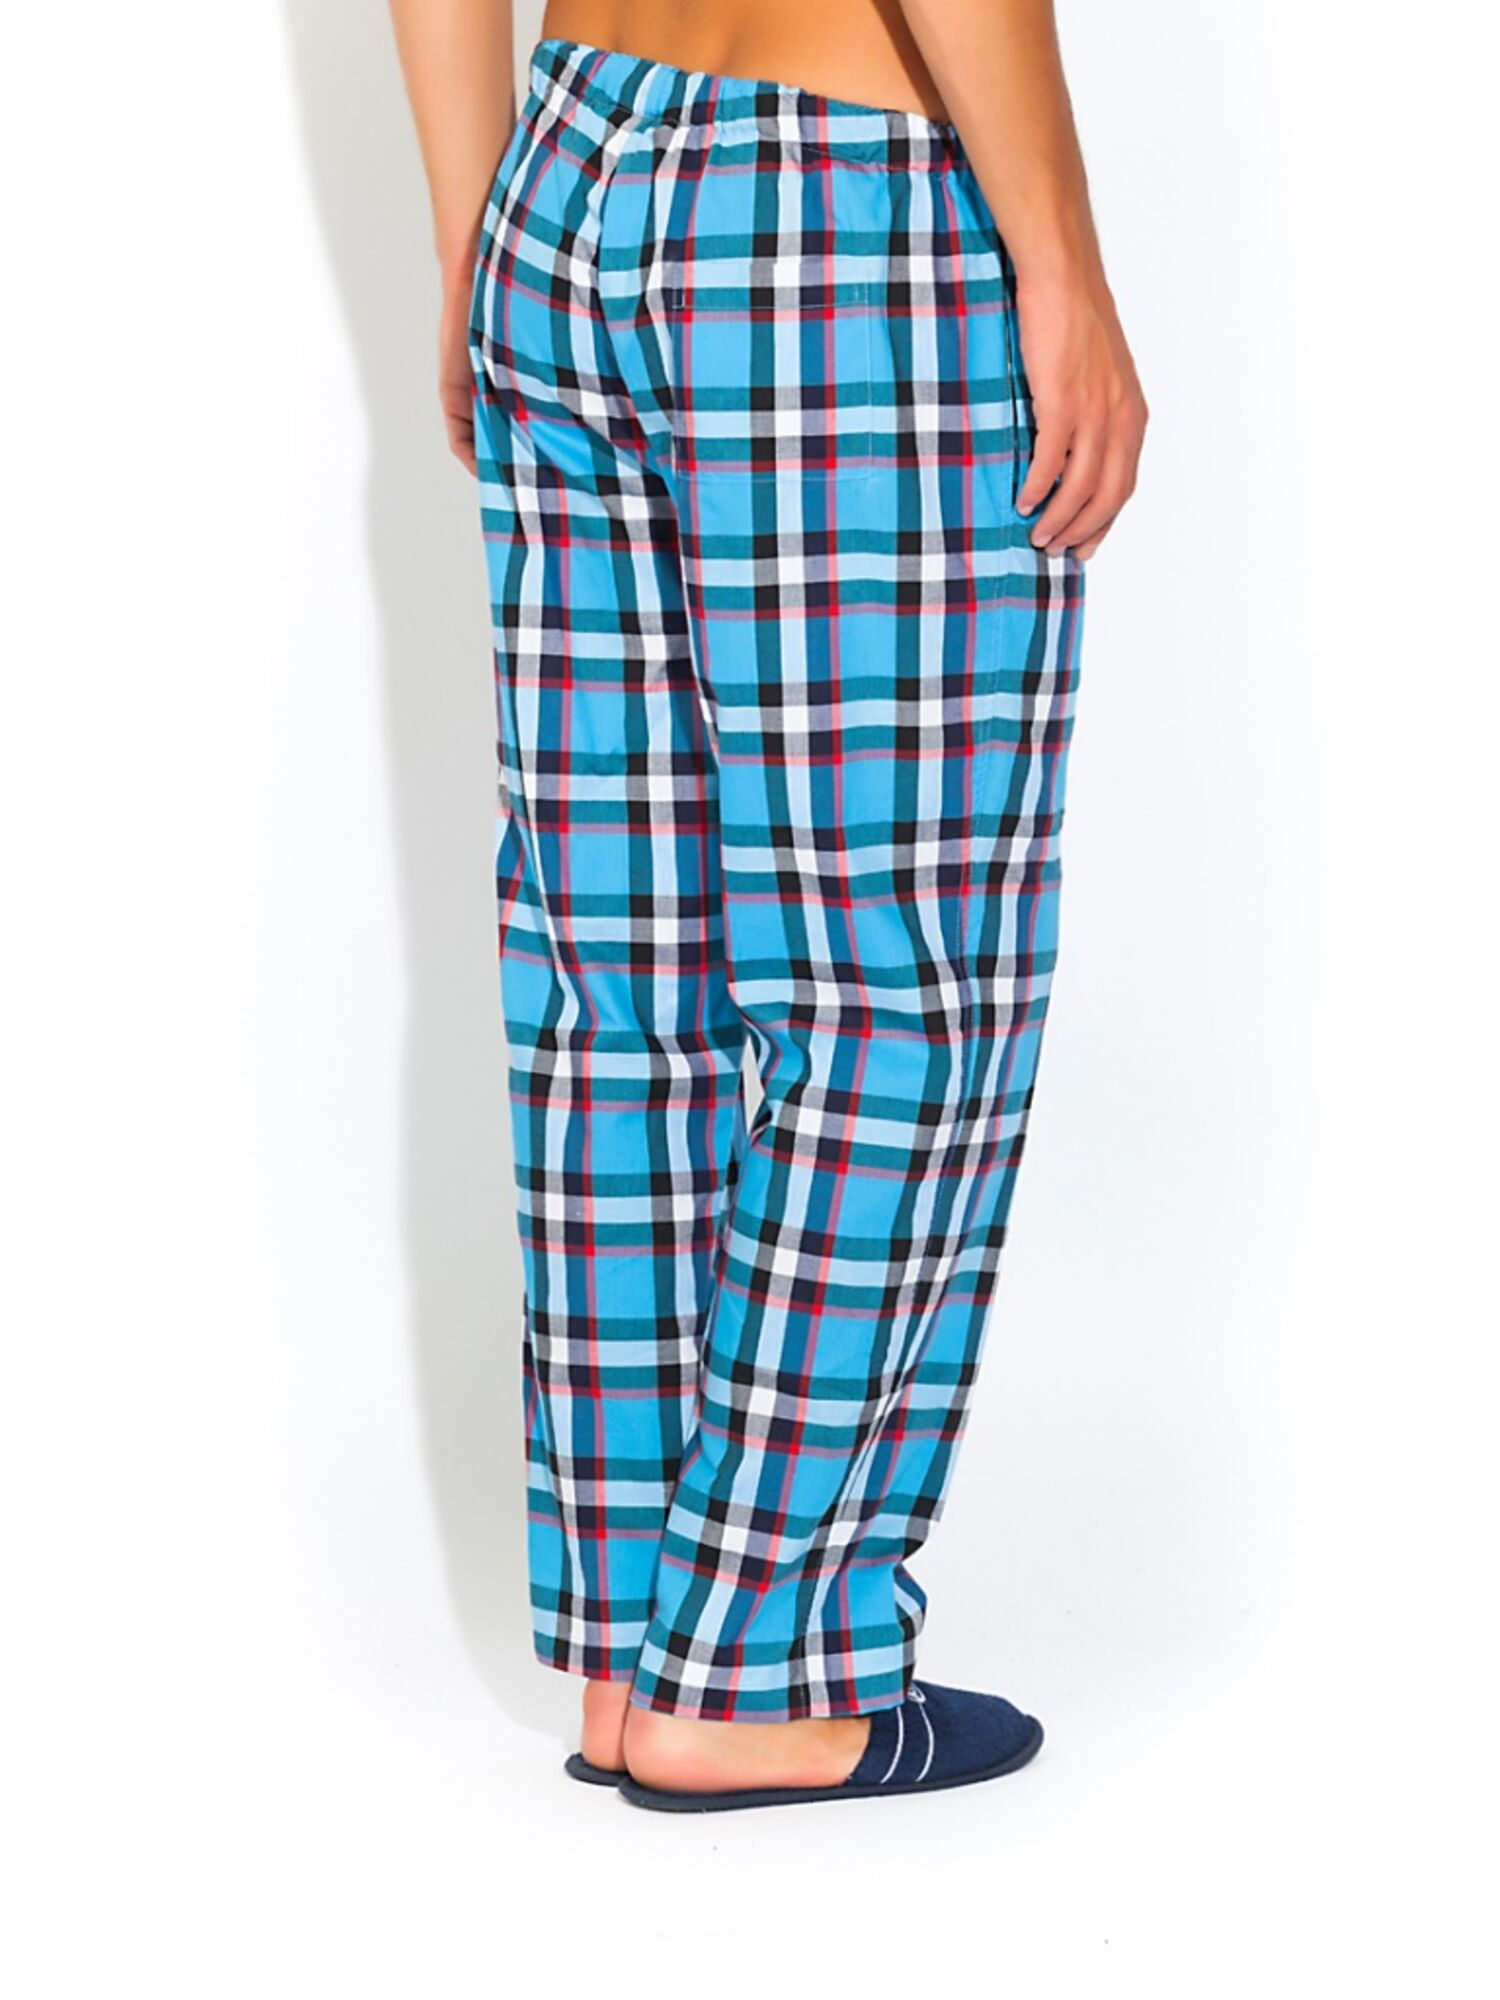 Мужские хлопковые брюки 002 VIKING 2135/5 голубая клетка, Peche Monnaie (Россия)